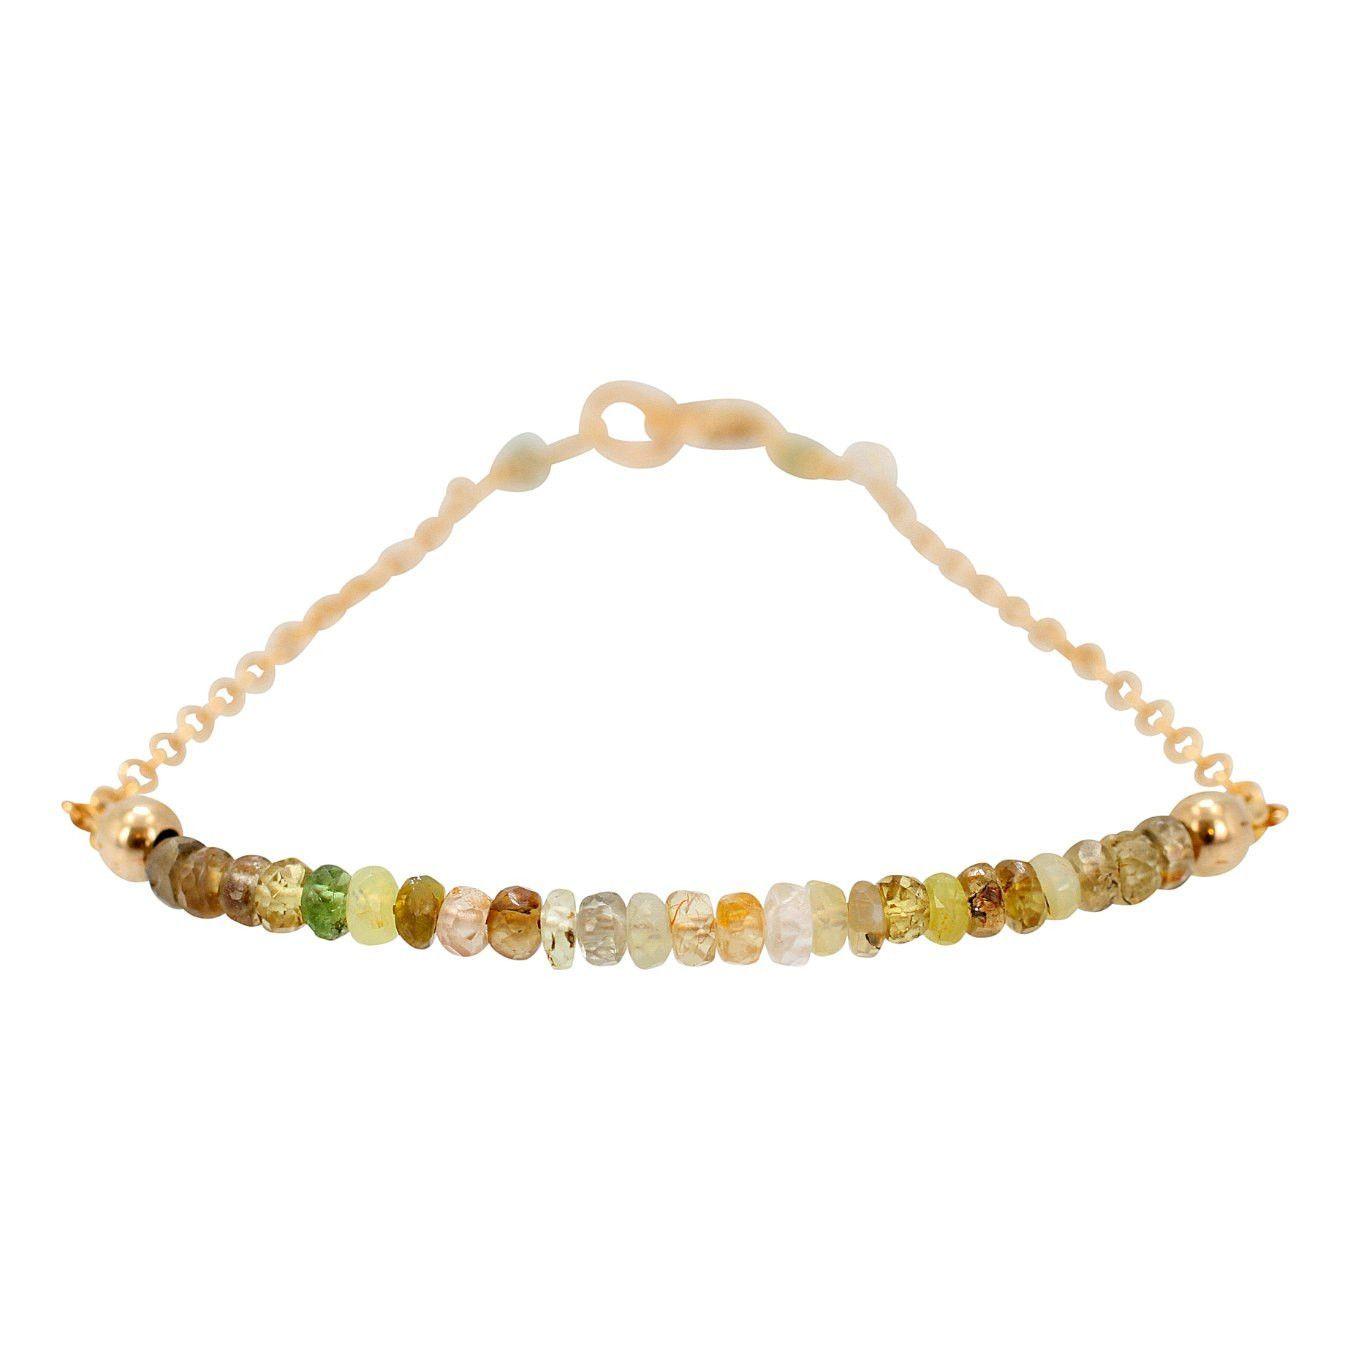 Green and Gold Chrysoberyl Gemstone Bracelet, #7070S